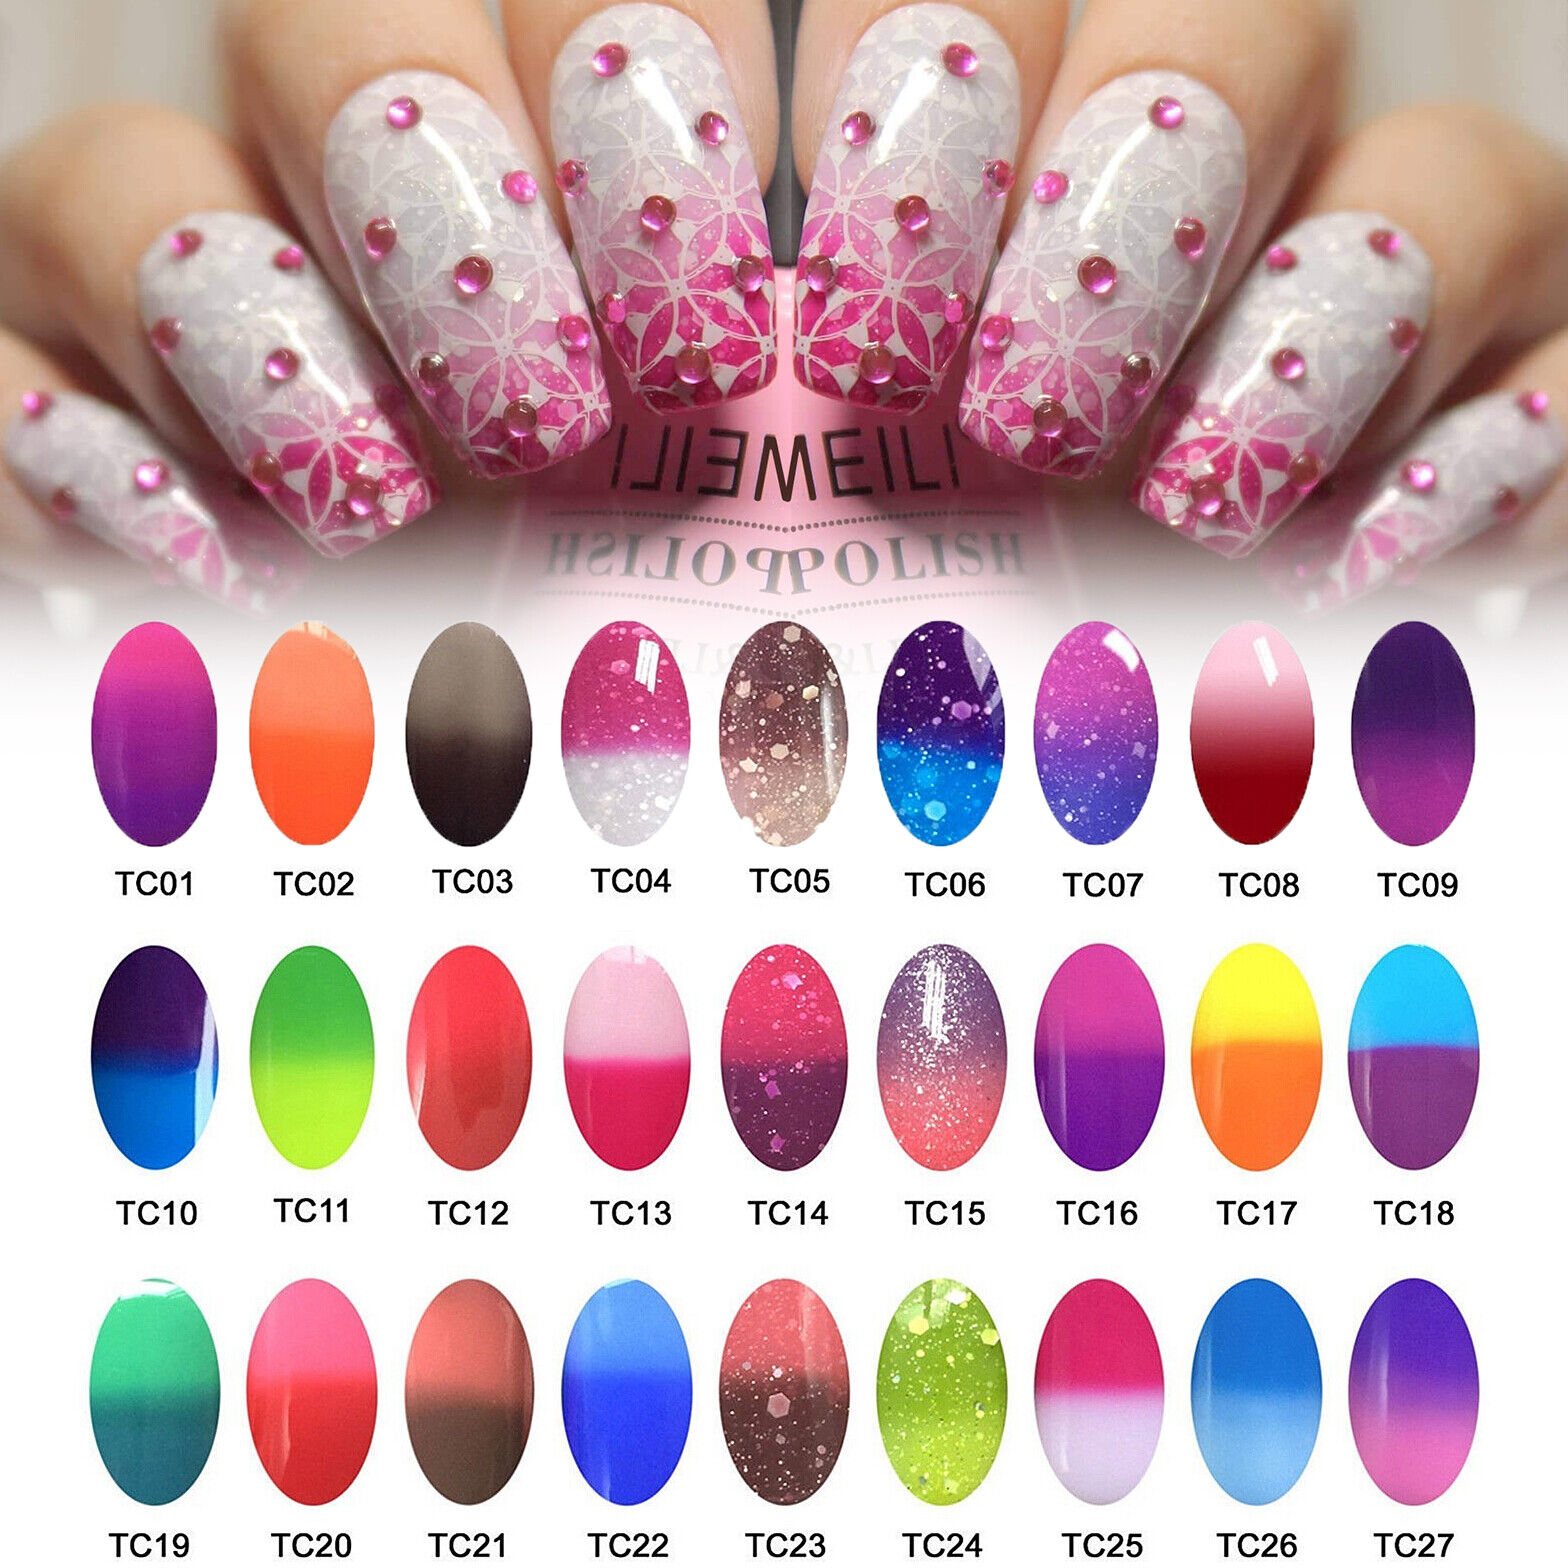 AIMEILI Temperature Color Change Gel Nail Polish Soak Off UV